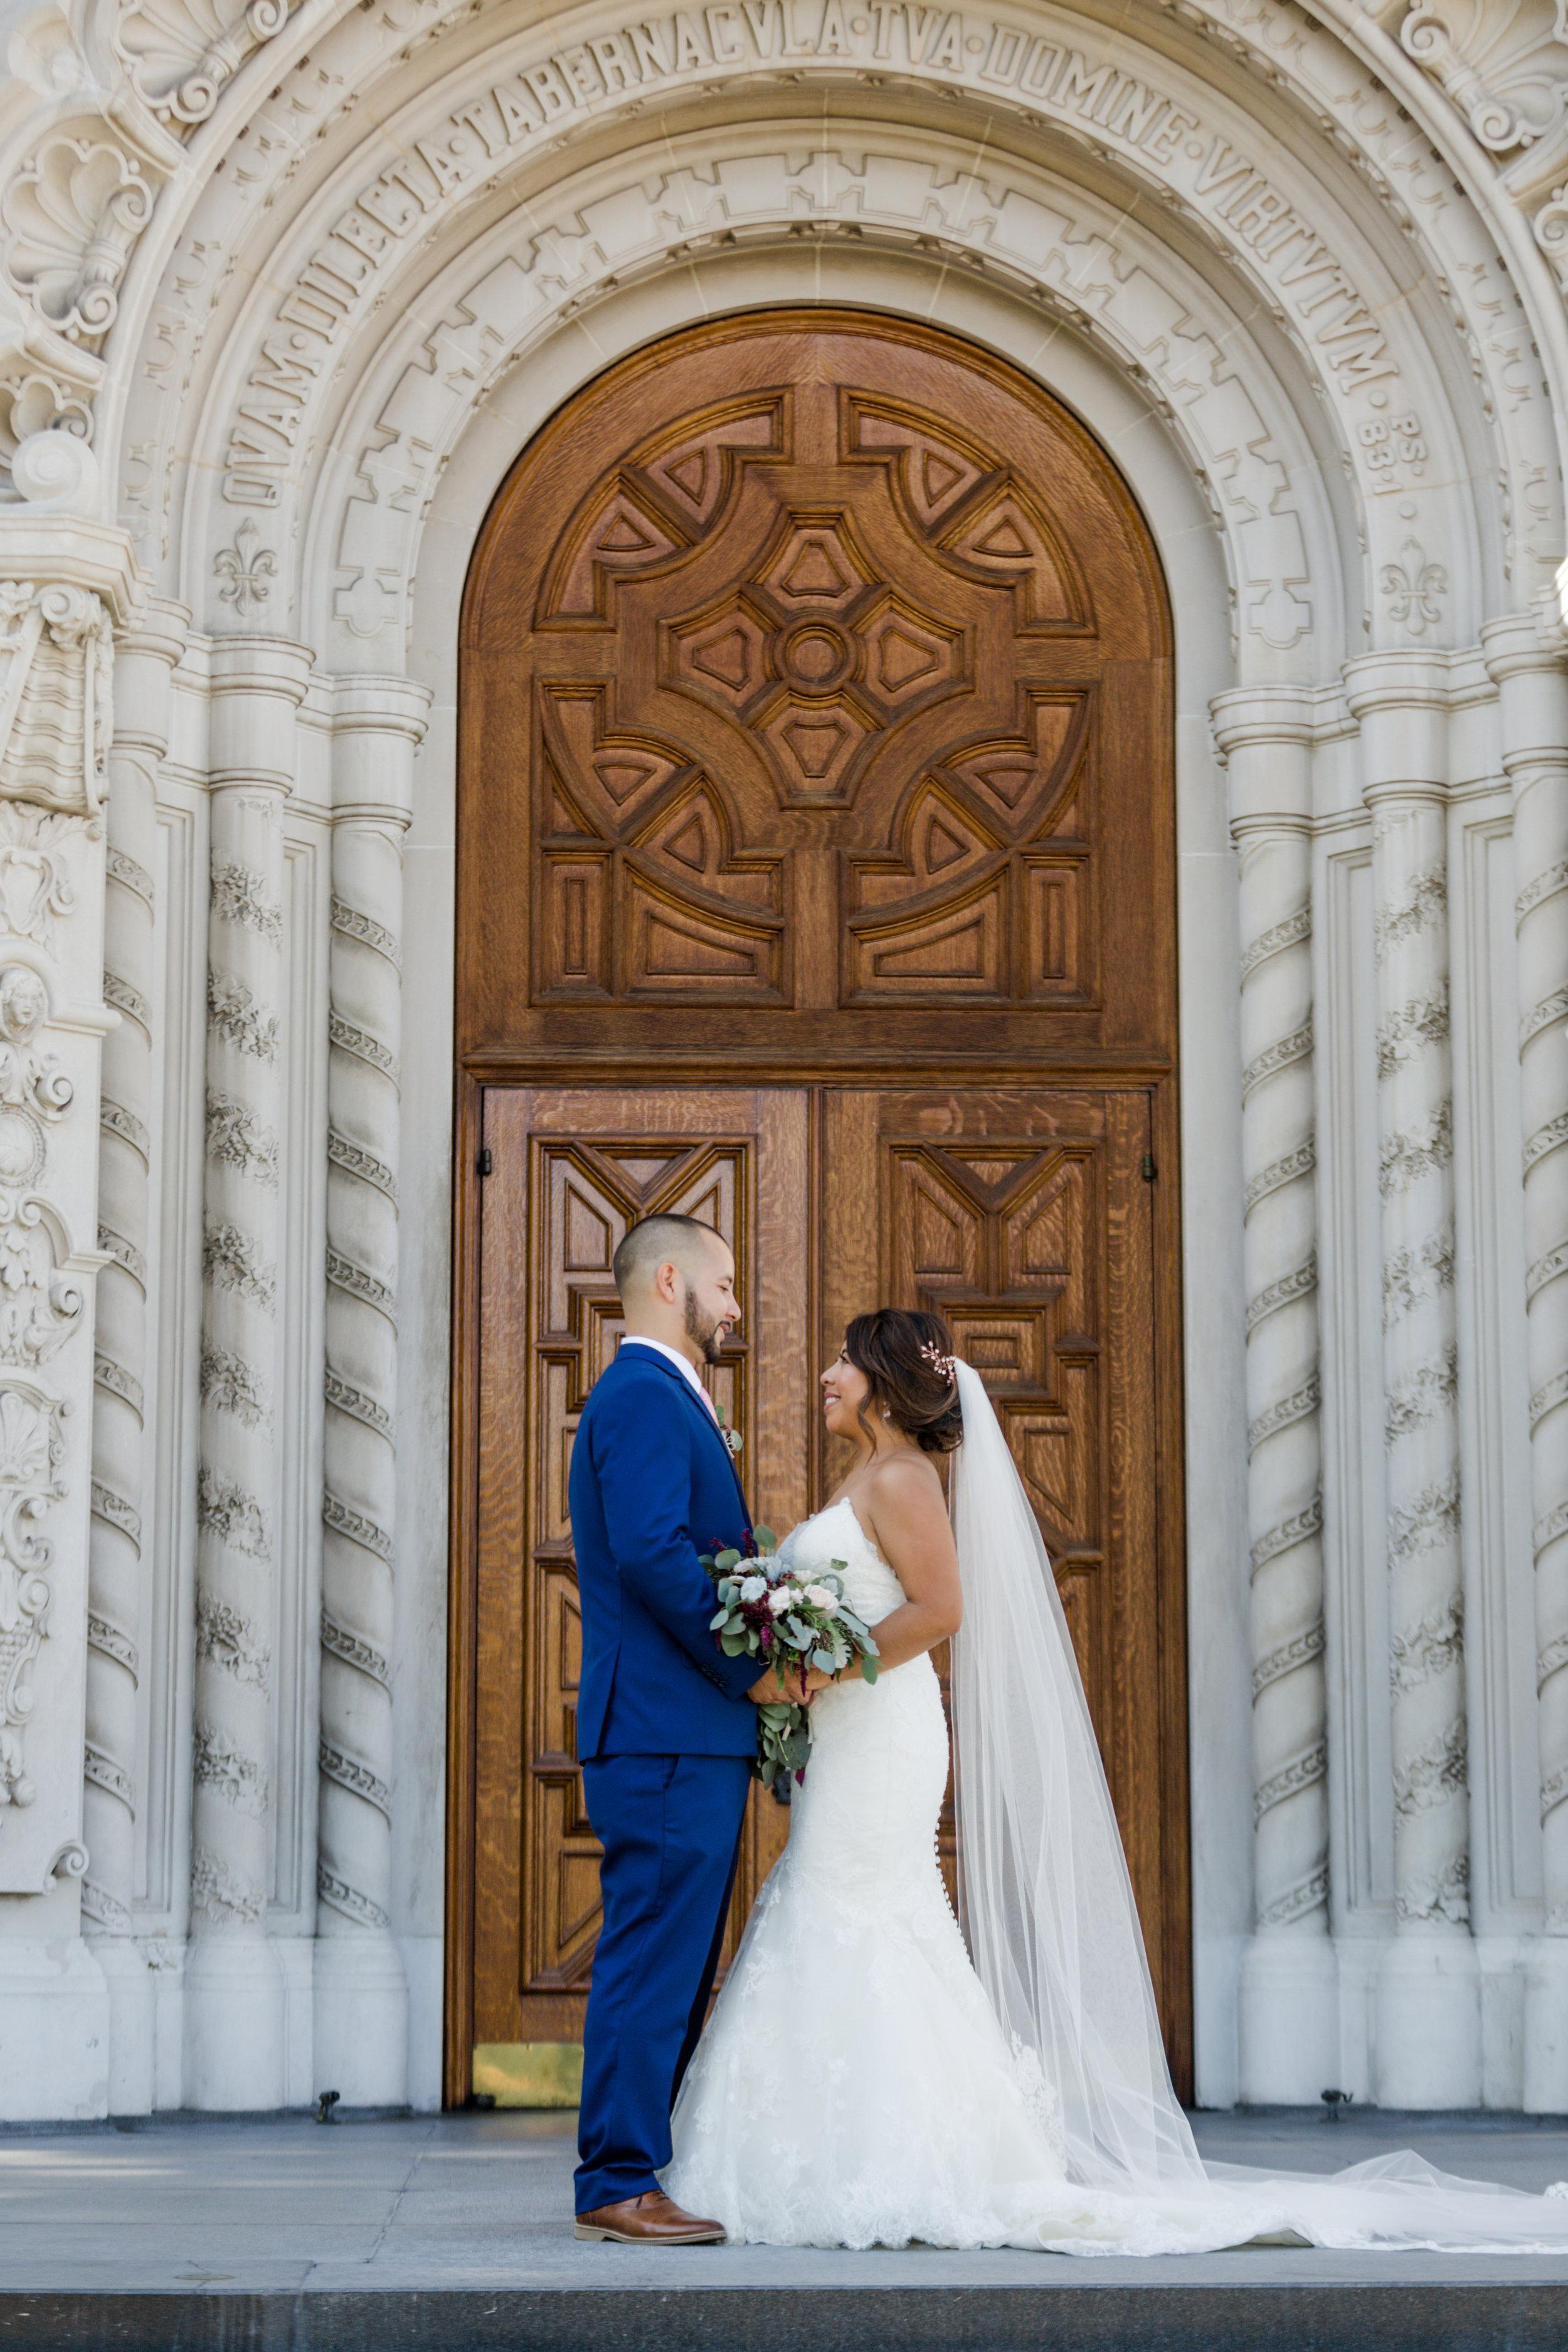 JasonSnorlaxPhotography Angela and Carlos 3